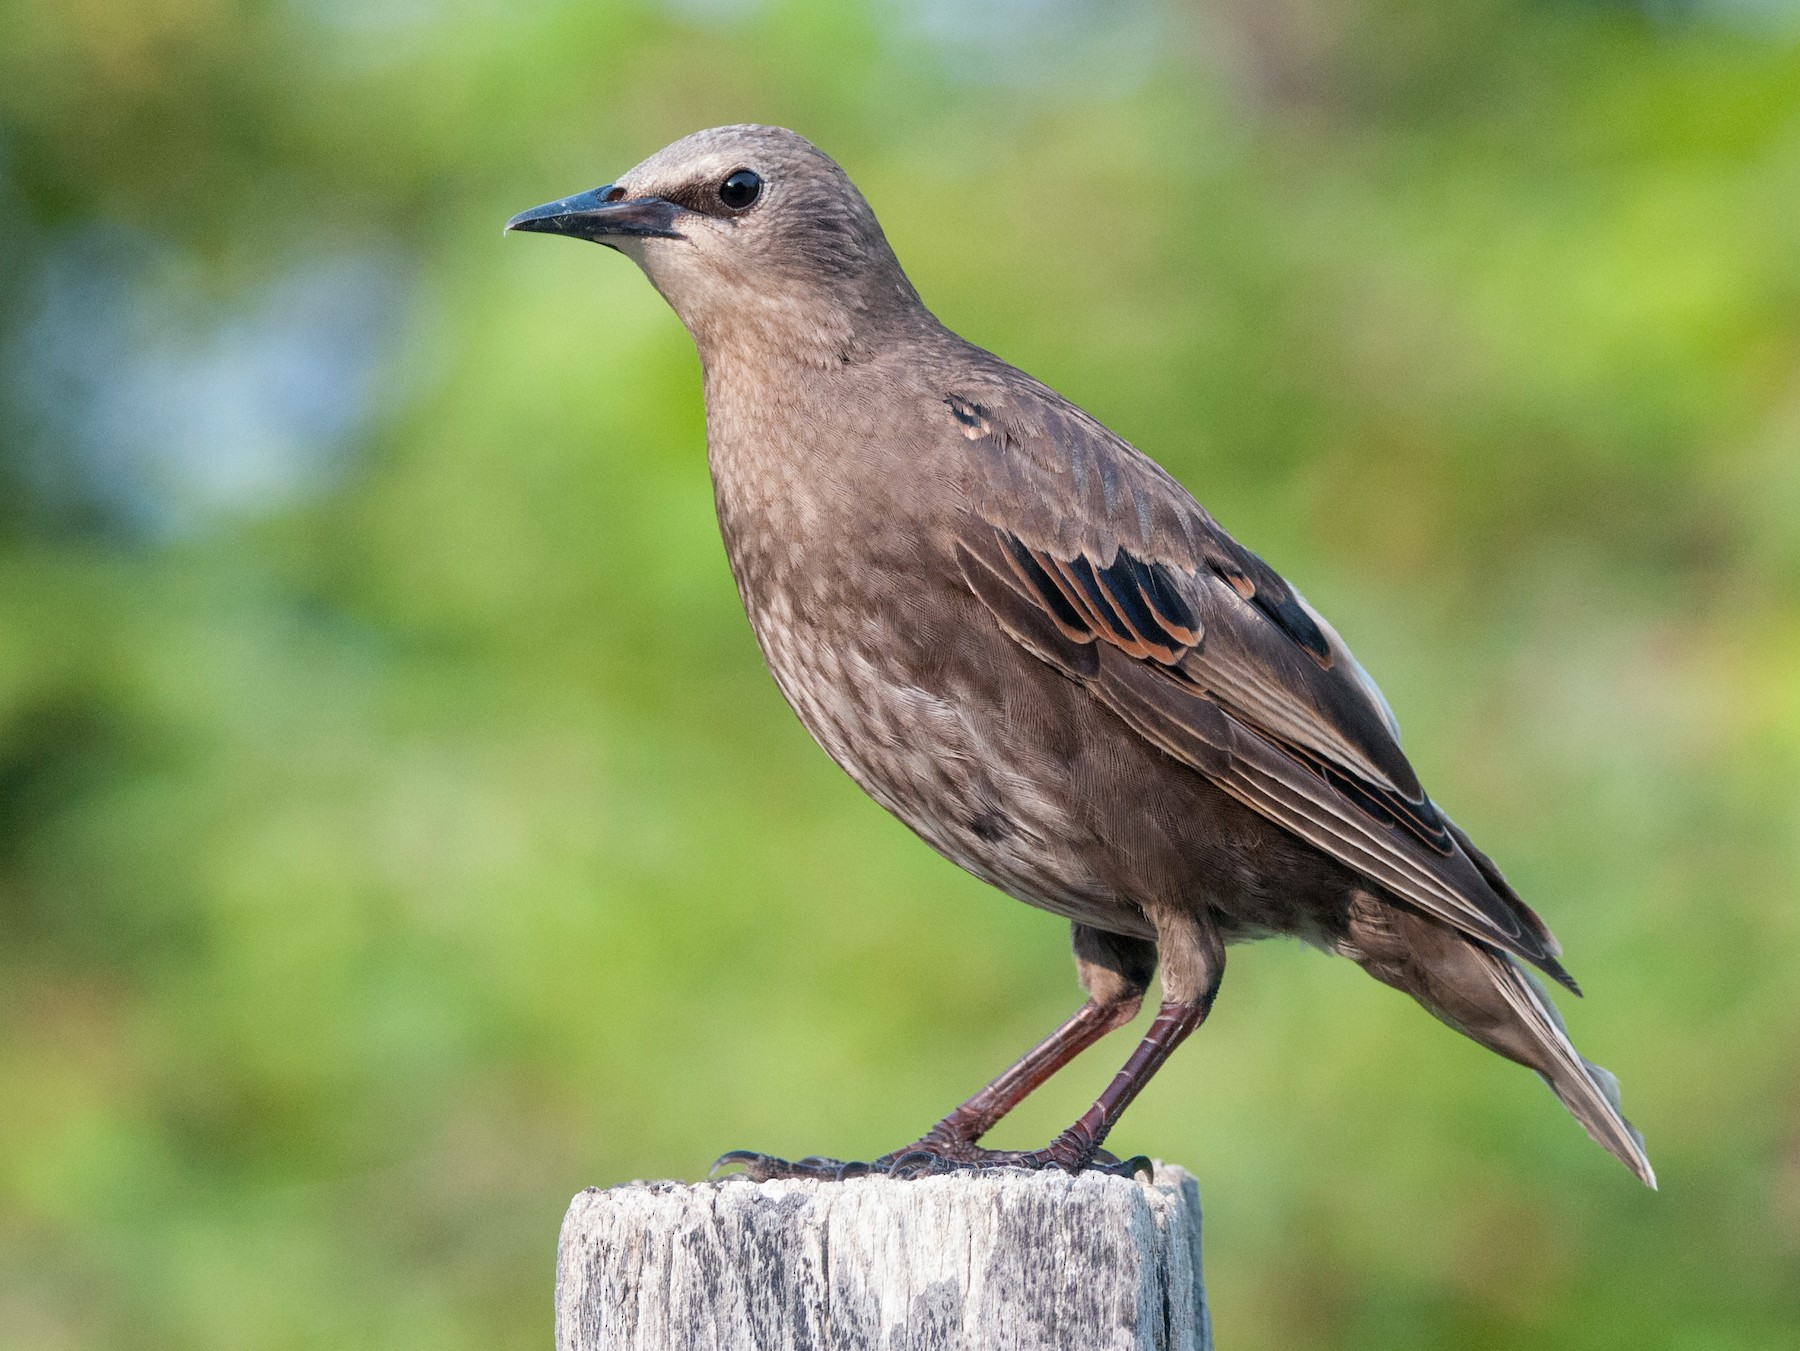 European Starling - Emily Turteltaub Nelson